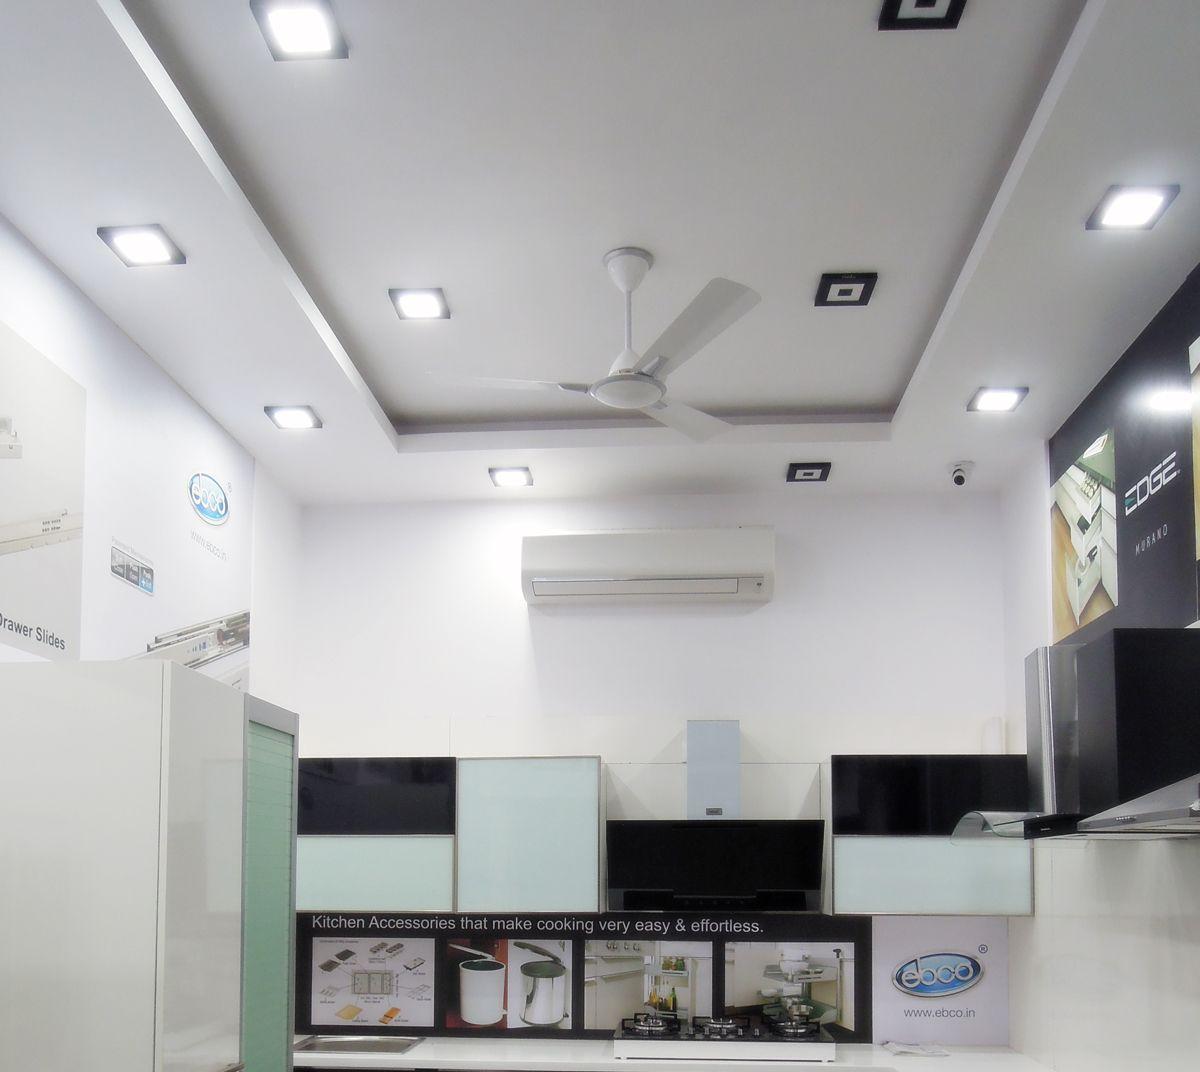 8w led recessed light for false ceiling ideas for the for False ceiling lighting ideas